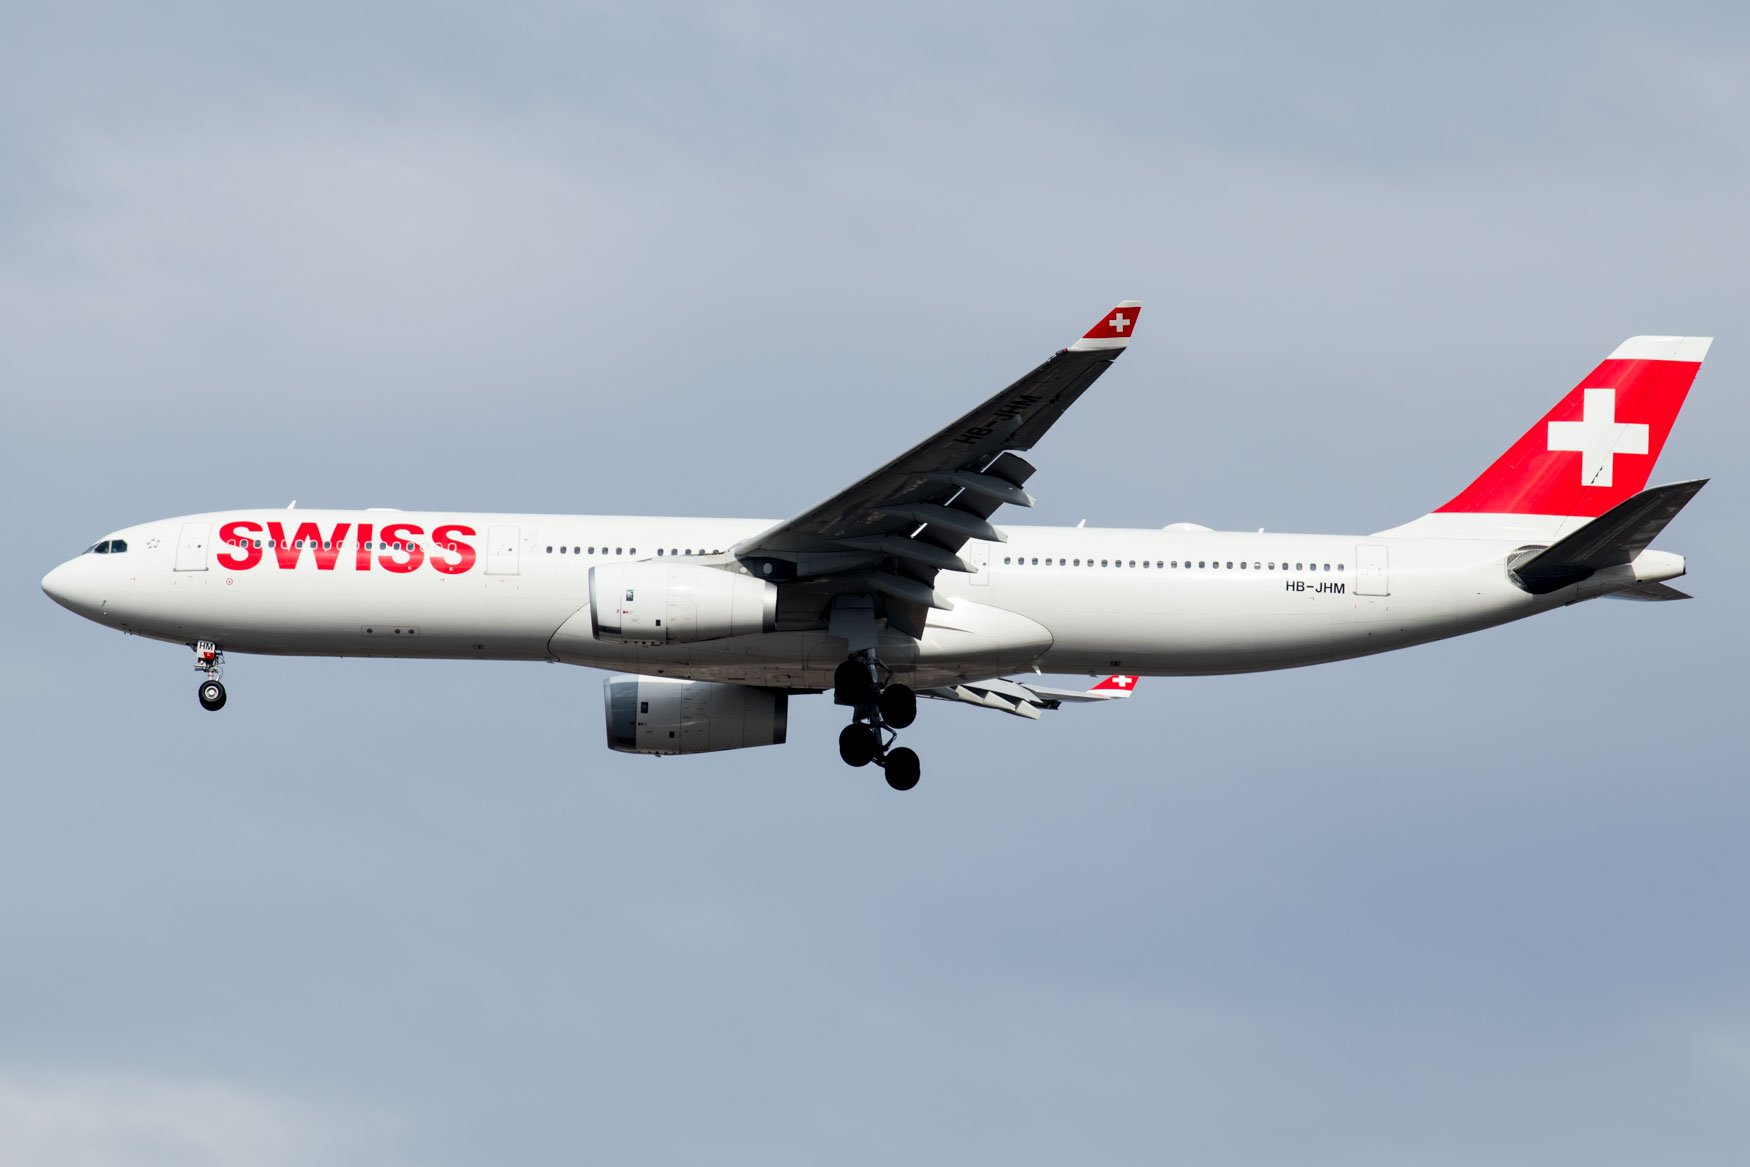 Swiss International Airlines A330 Landing at JFK